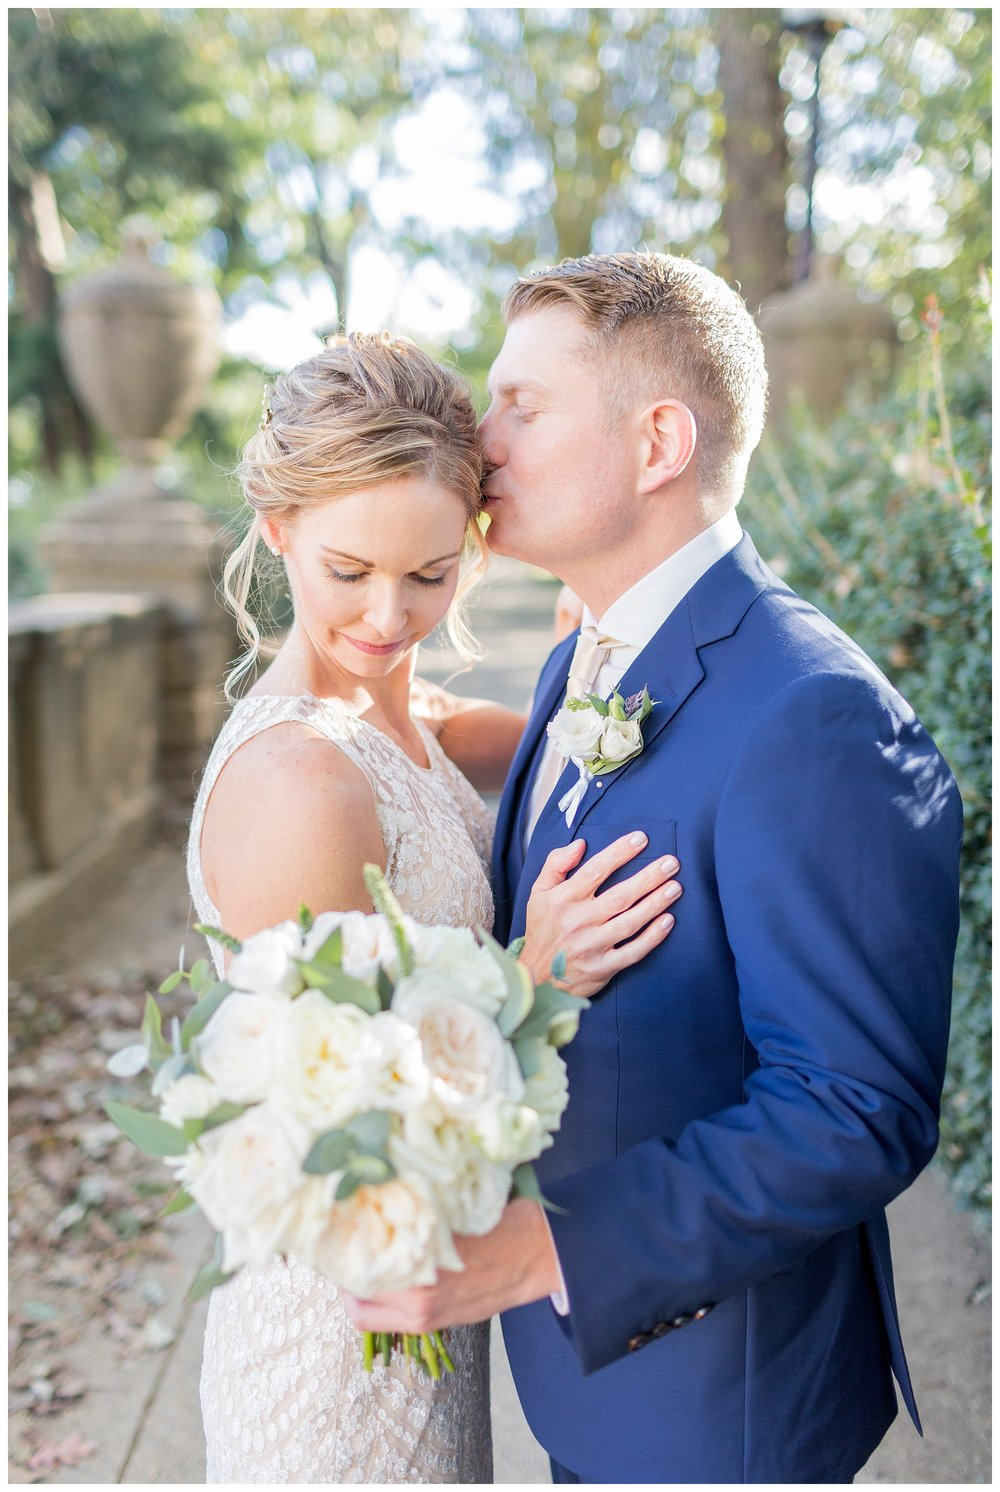 Meridian Hill Park Wedding | Washington DC Wedding Photographer Kir Tuben_0033.jpg